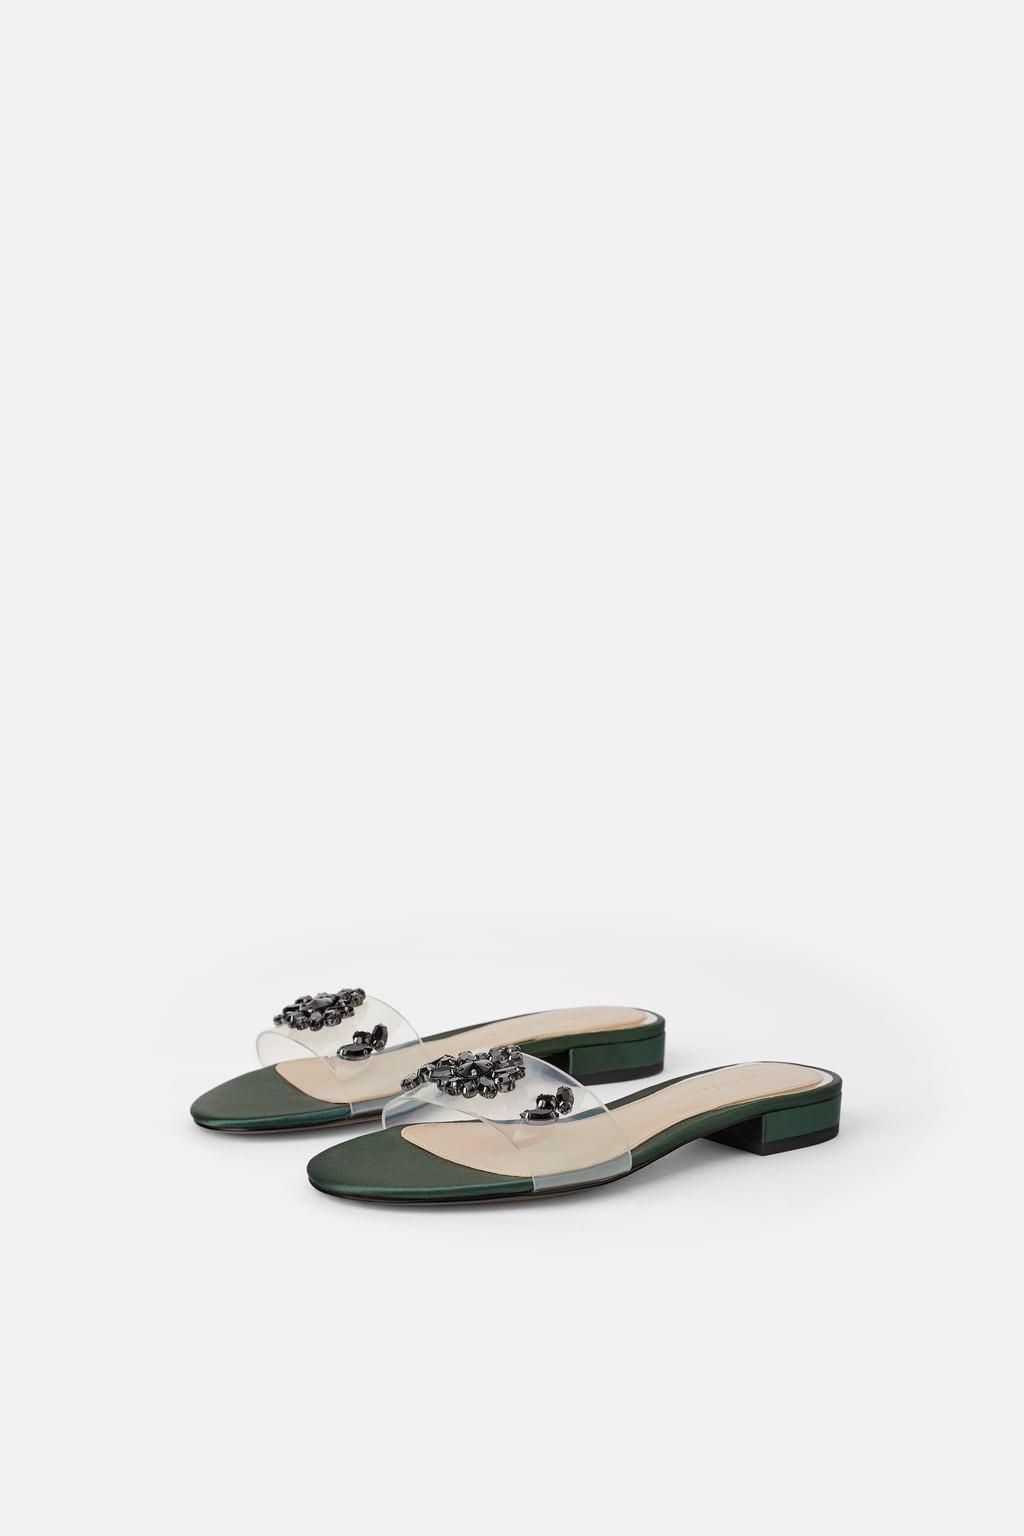 Sandália rasa de vinil com joia (22,99 euros, antes 29,95) Zara.jpg